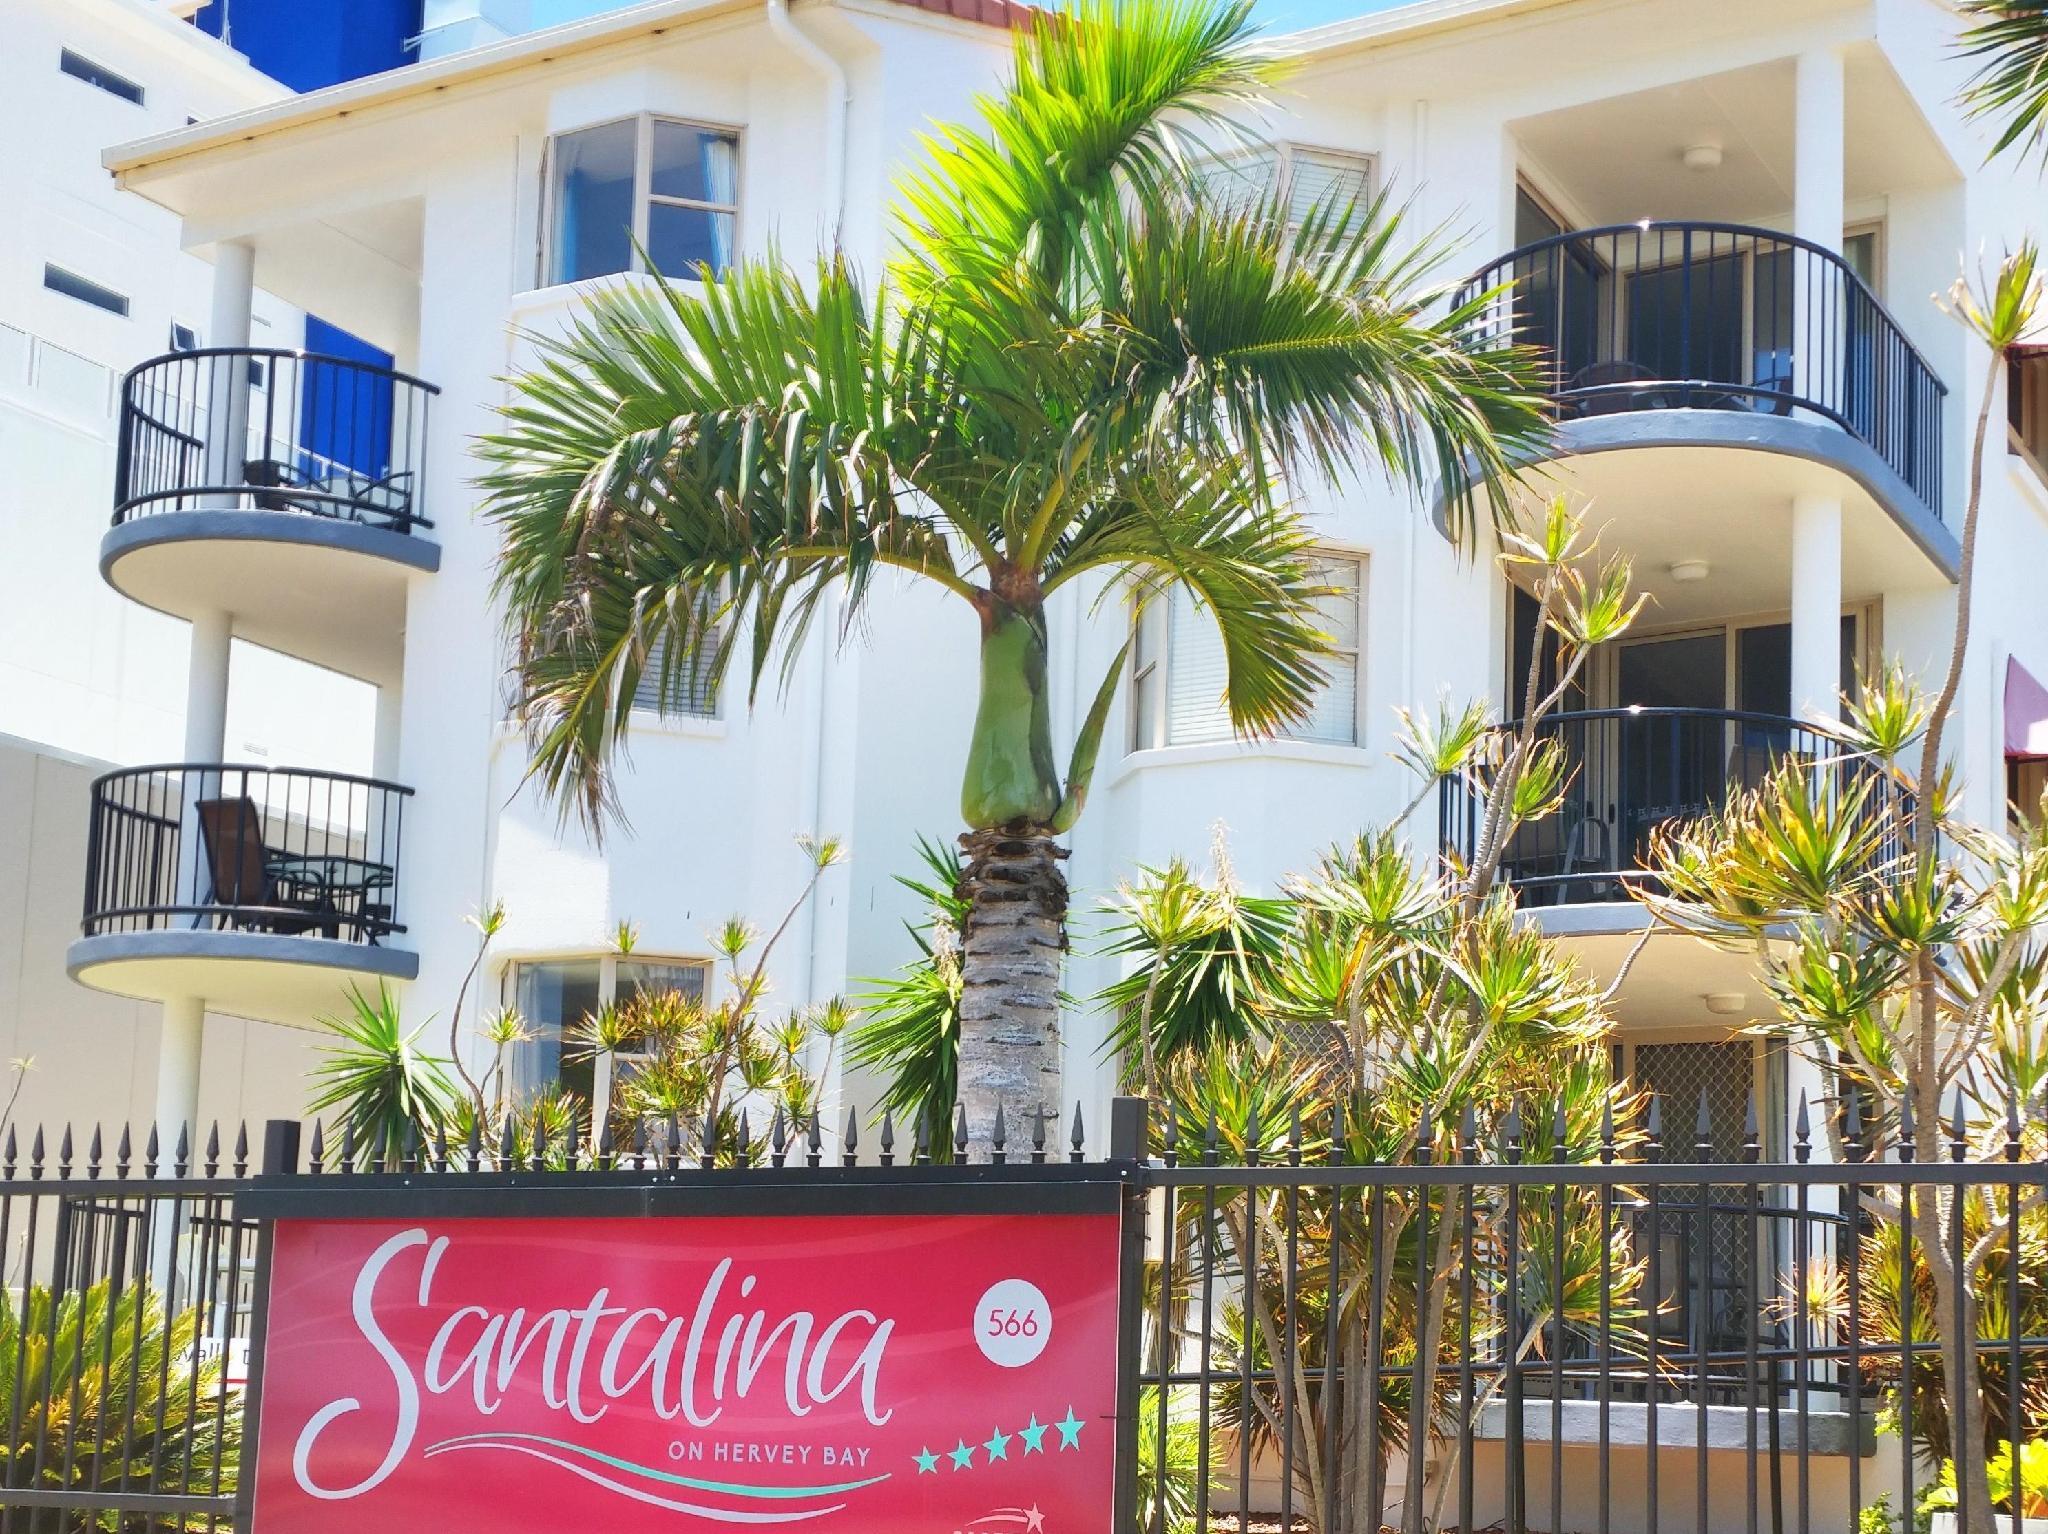 Santalina on Hervey Bay - Hervey Bay